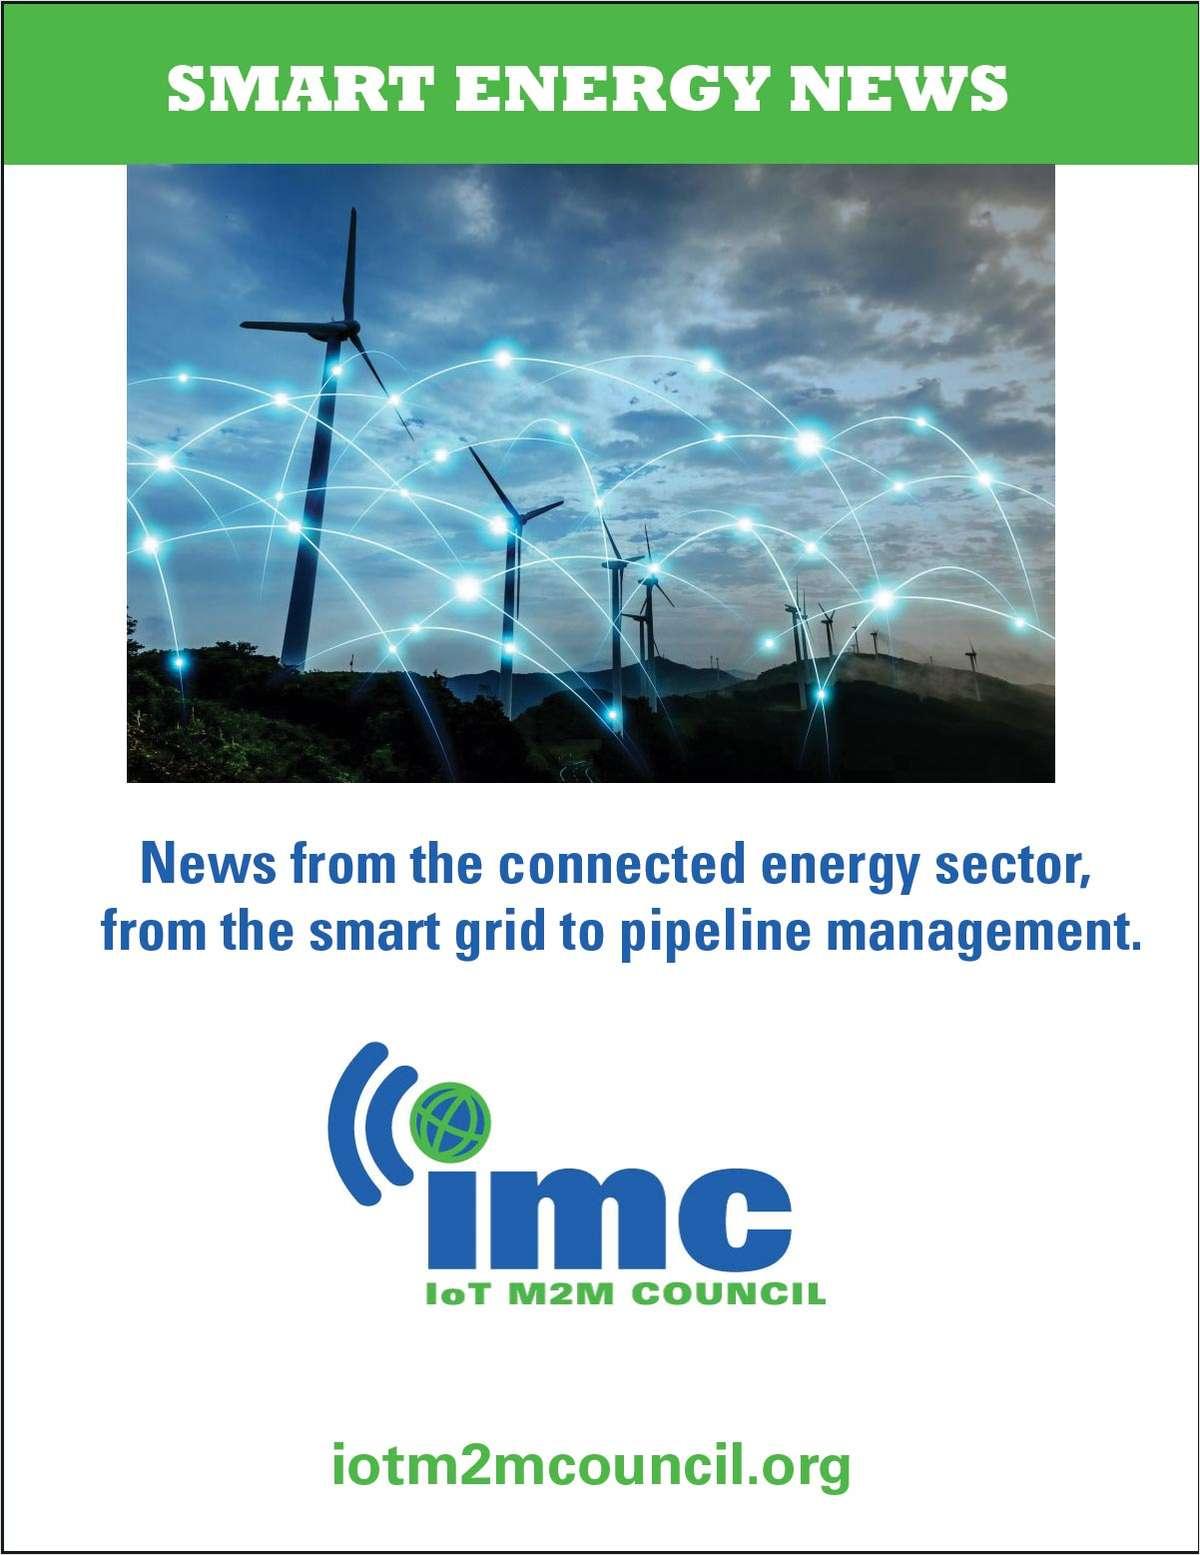 SMART ENERGY NEWS